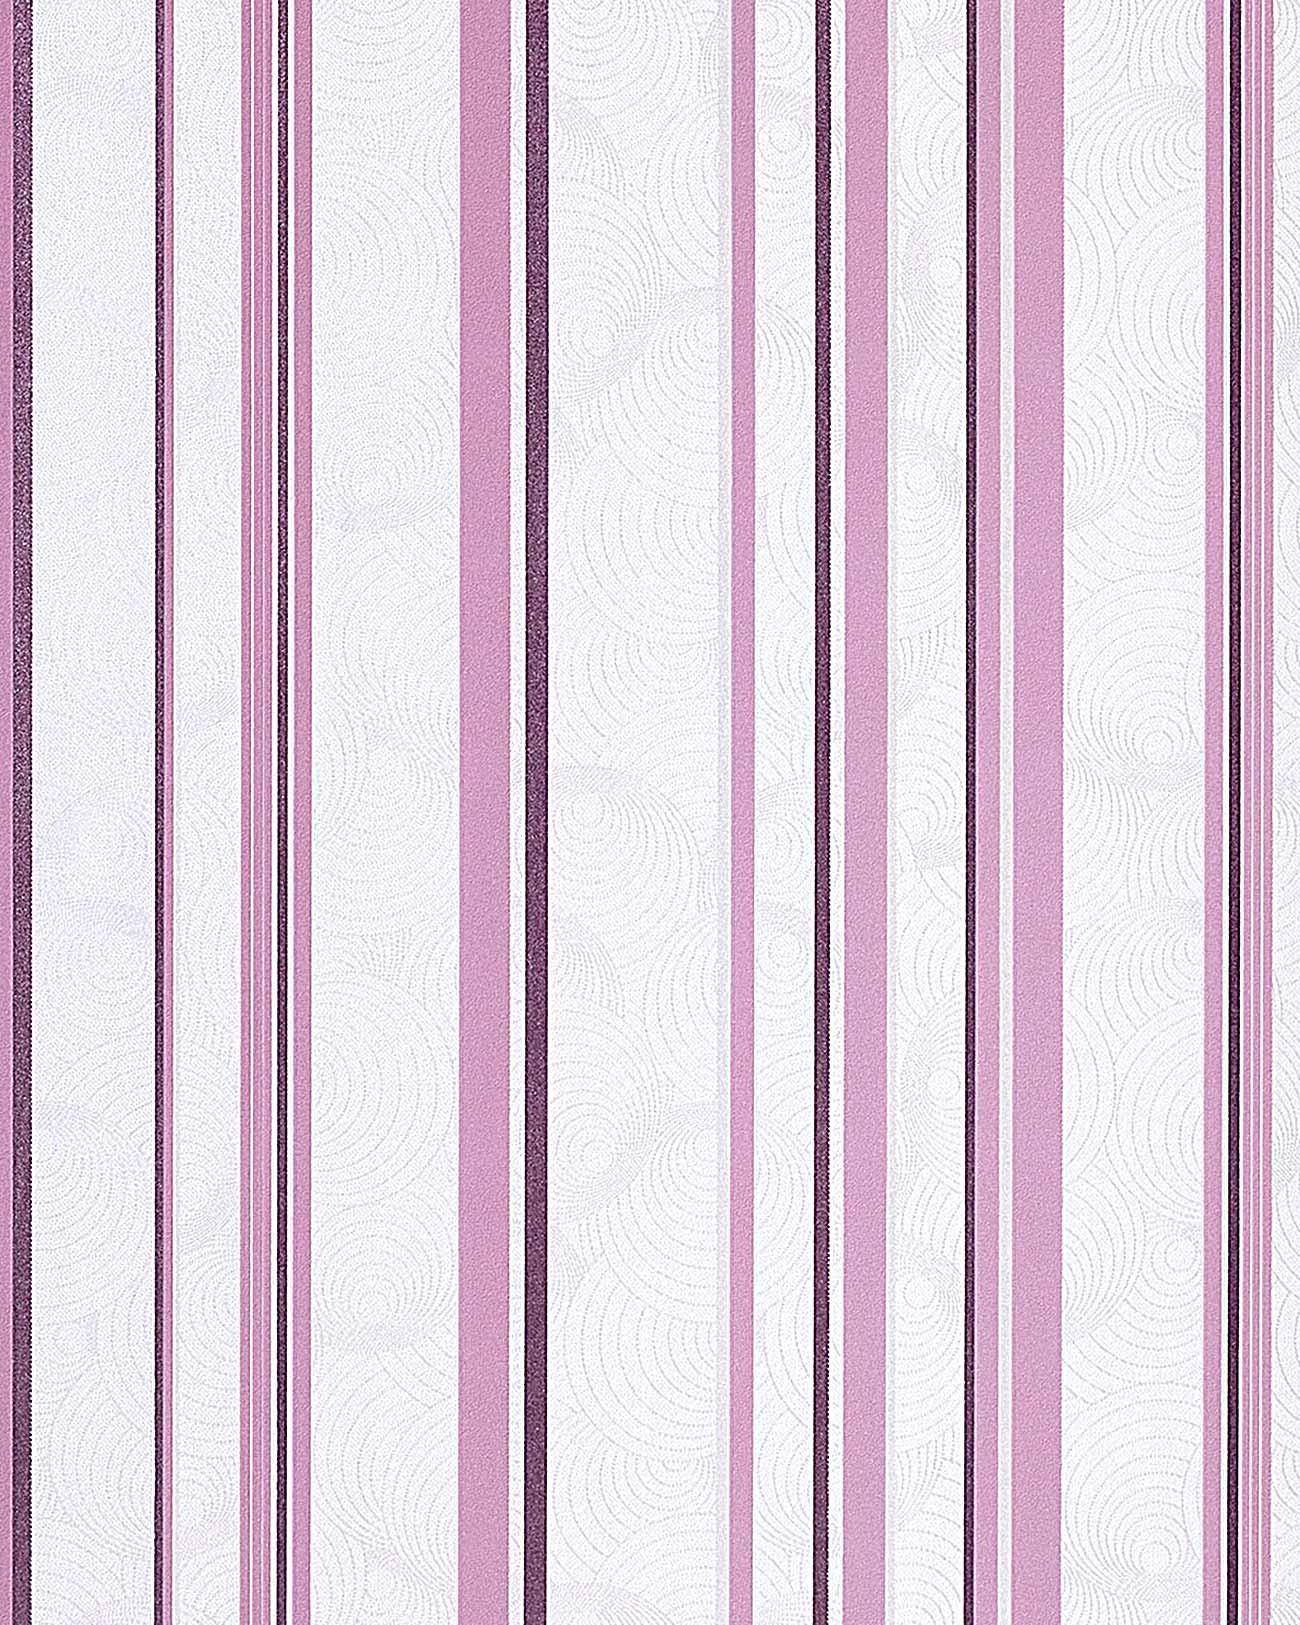 edem 059 24 retro sweet summer design streifen tapete. Black Bedroom Furniture Sets. Home Design Ideas